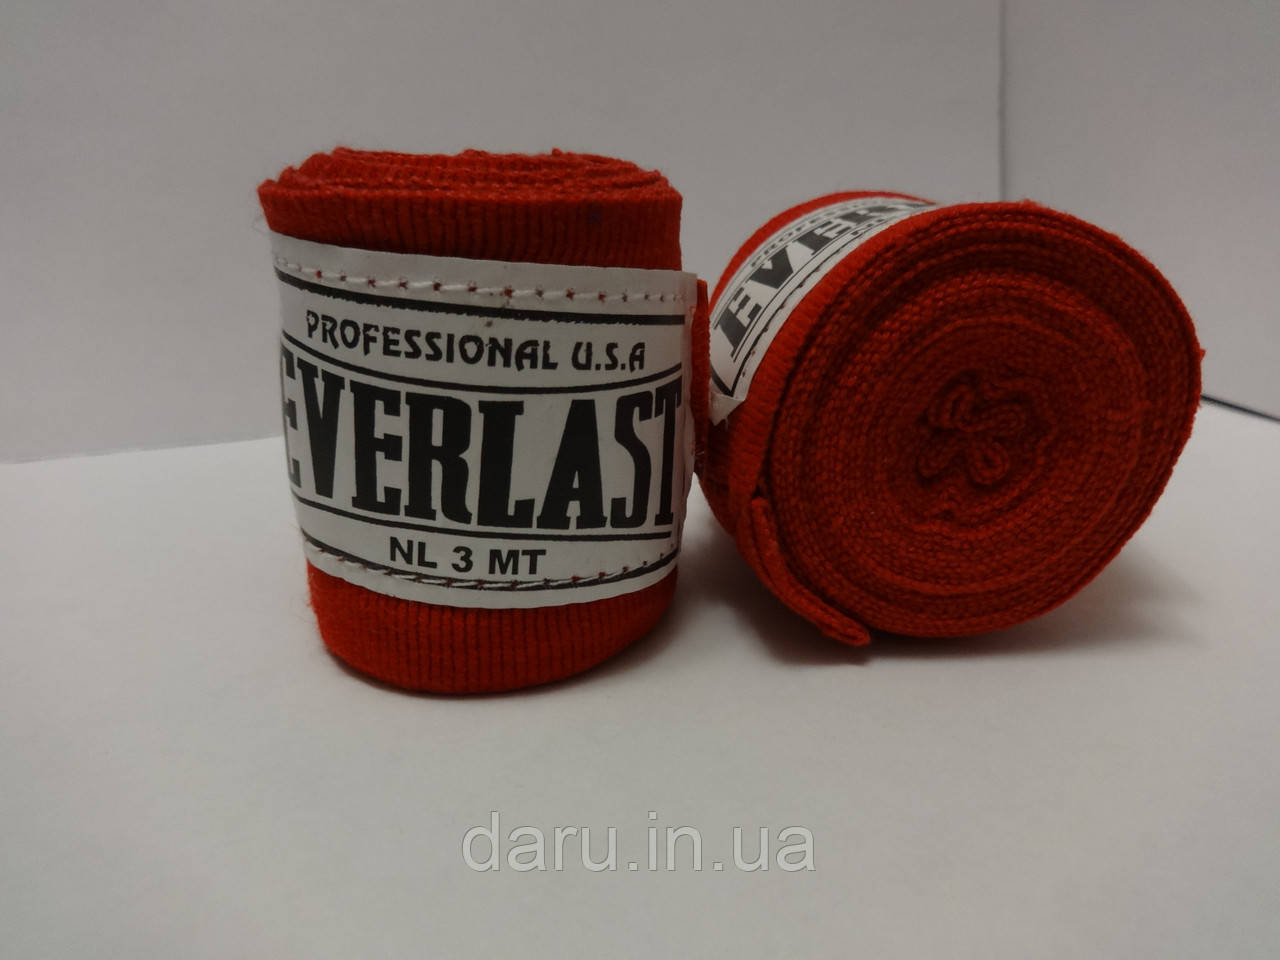 Боксерский бинт EVERLAST - 3 м, 2 цвета